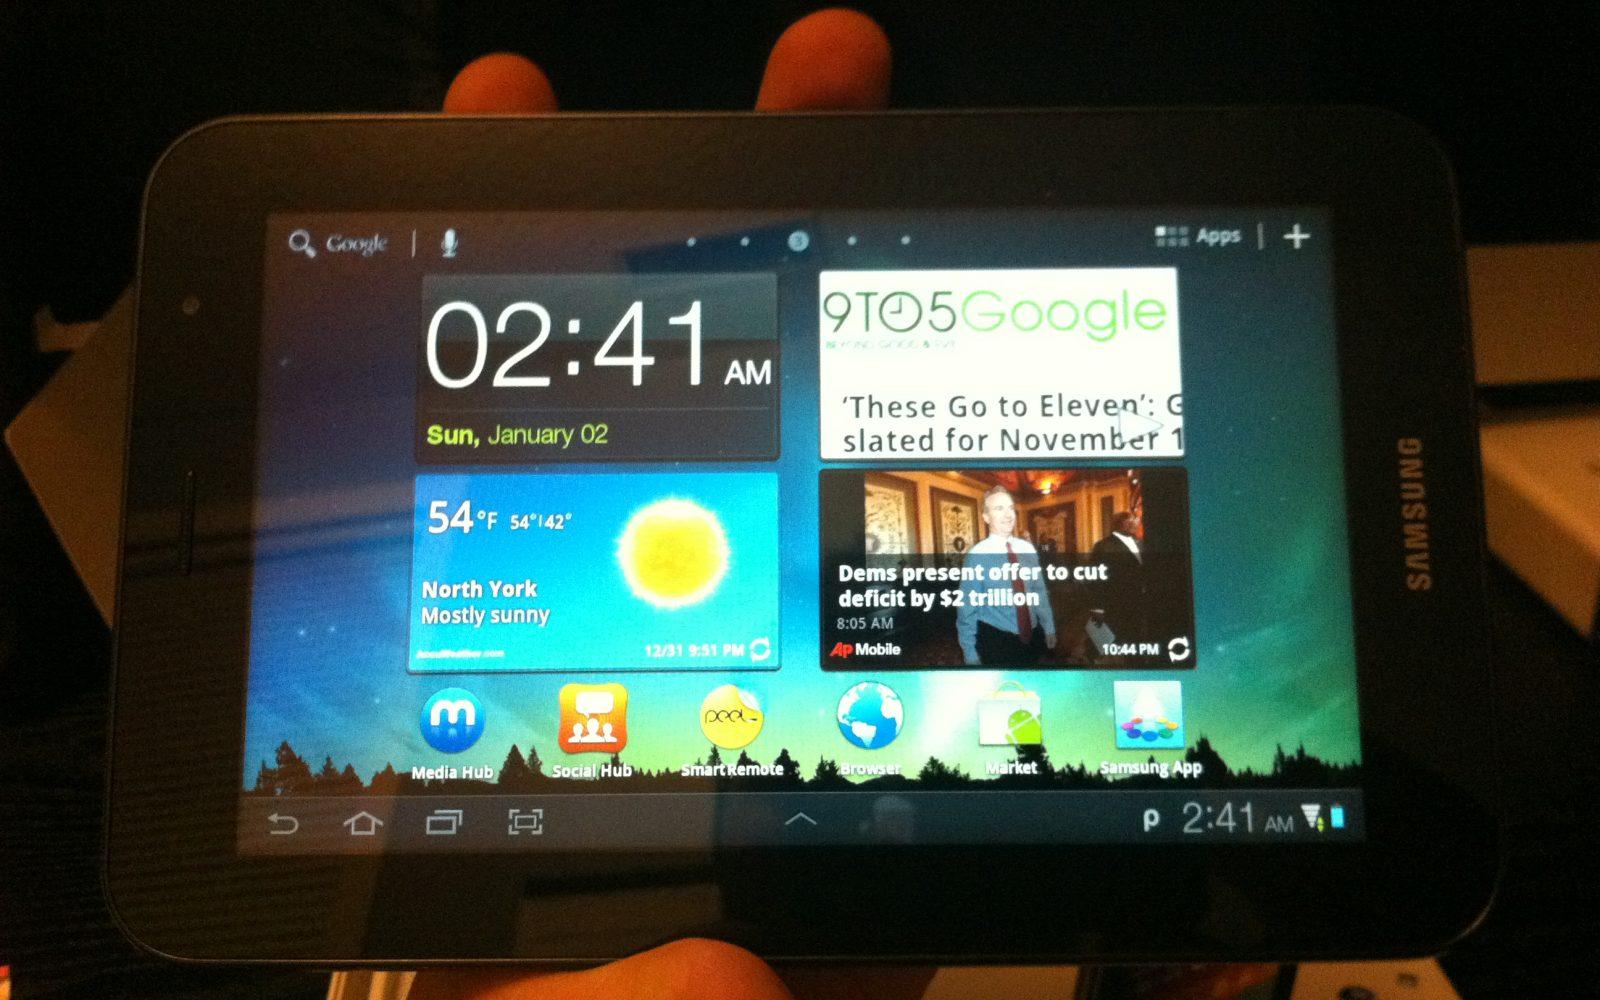 Review: Samsung Galaxy Tab 7 0 Plus - Fantastic form factor